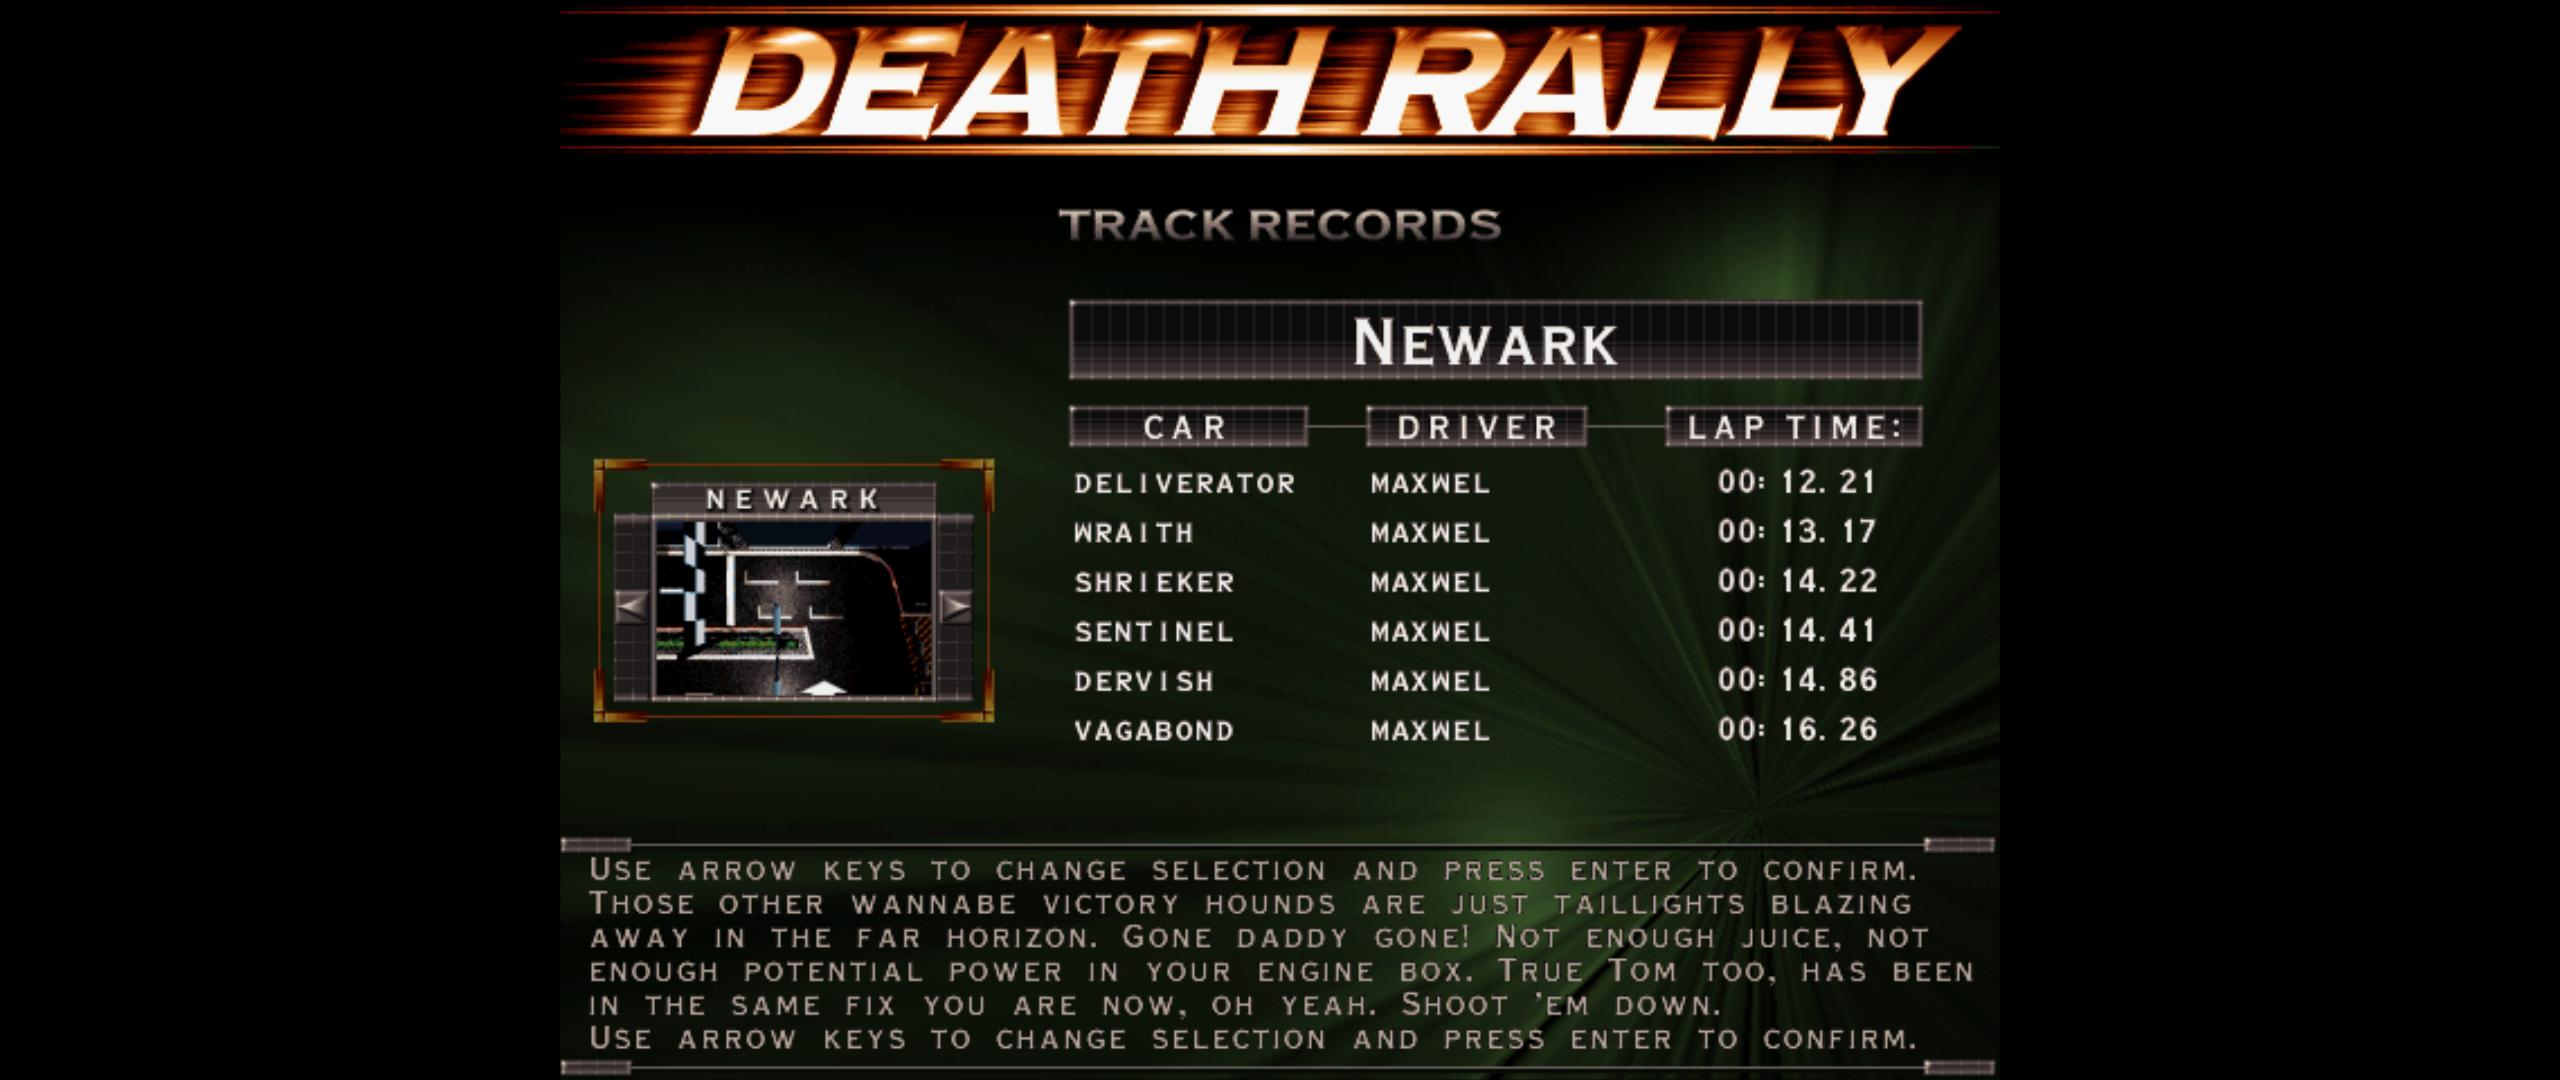 Maxwel: Death Rally [New Ark, Dervish Car Car] (PC) 0:00:14.86 points on 2016-03-04 07:59:44